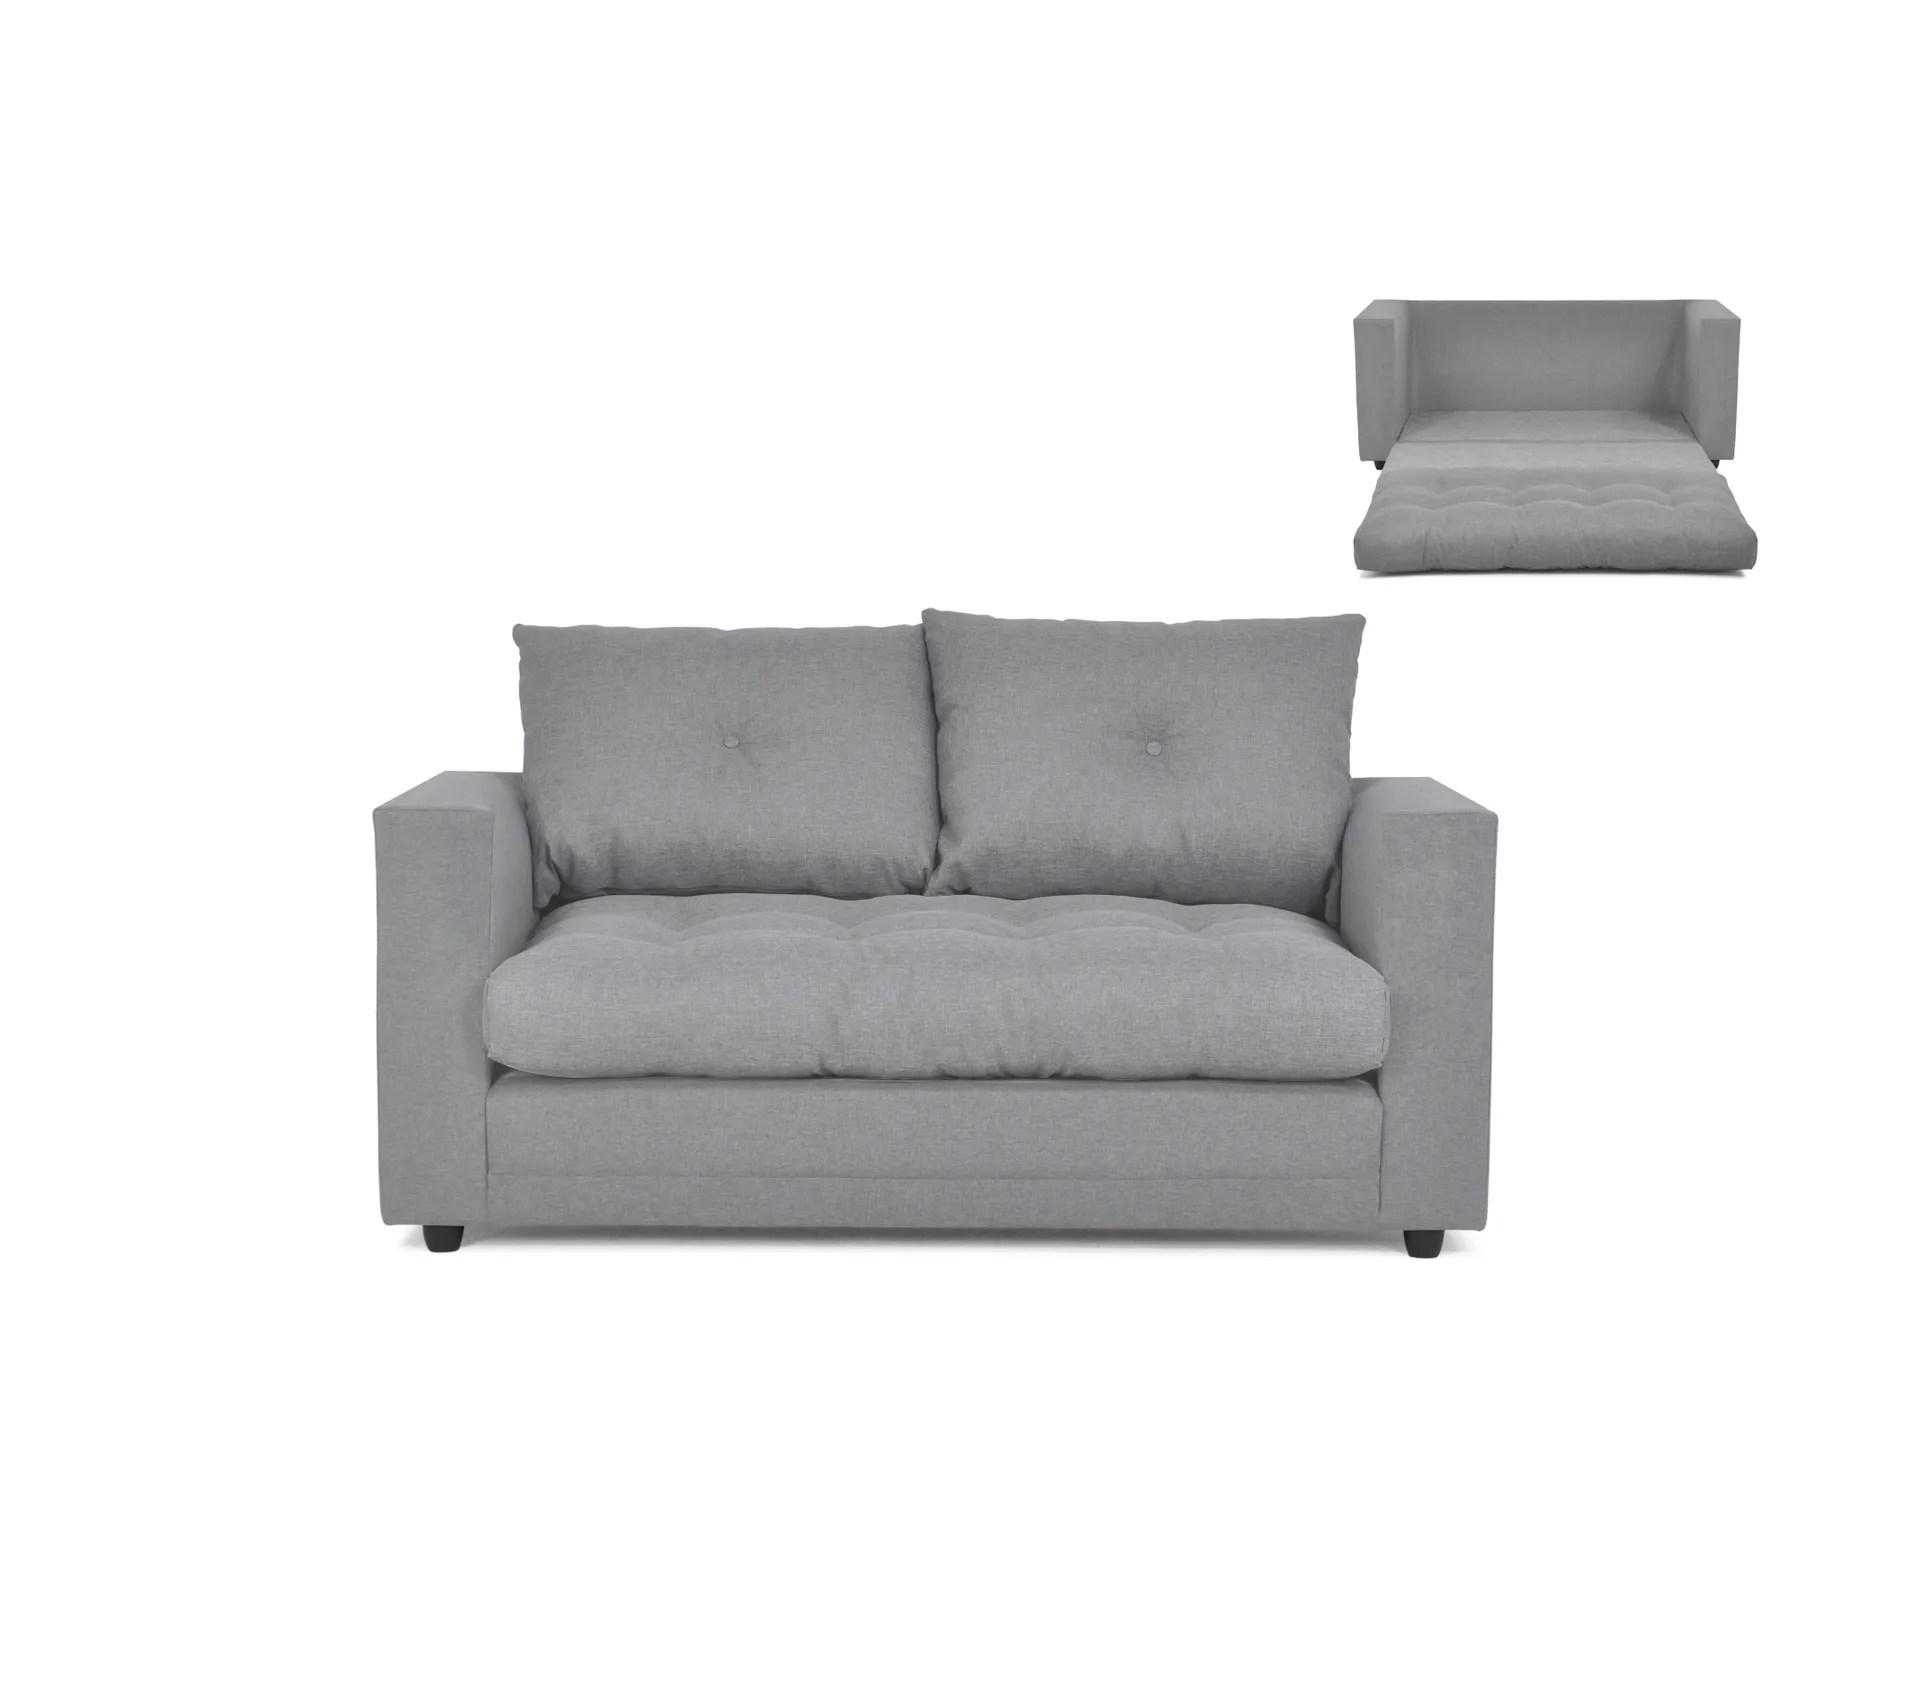 canape 2 places convertible tissu gris clair